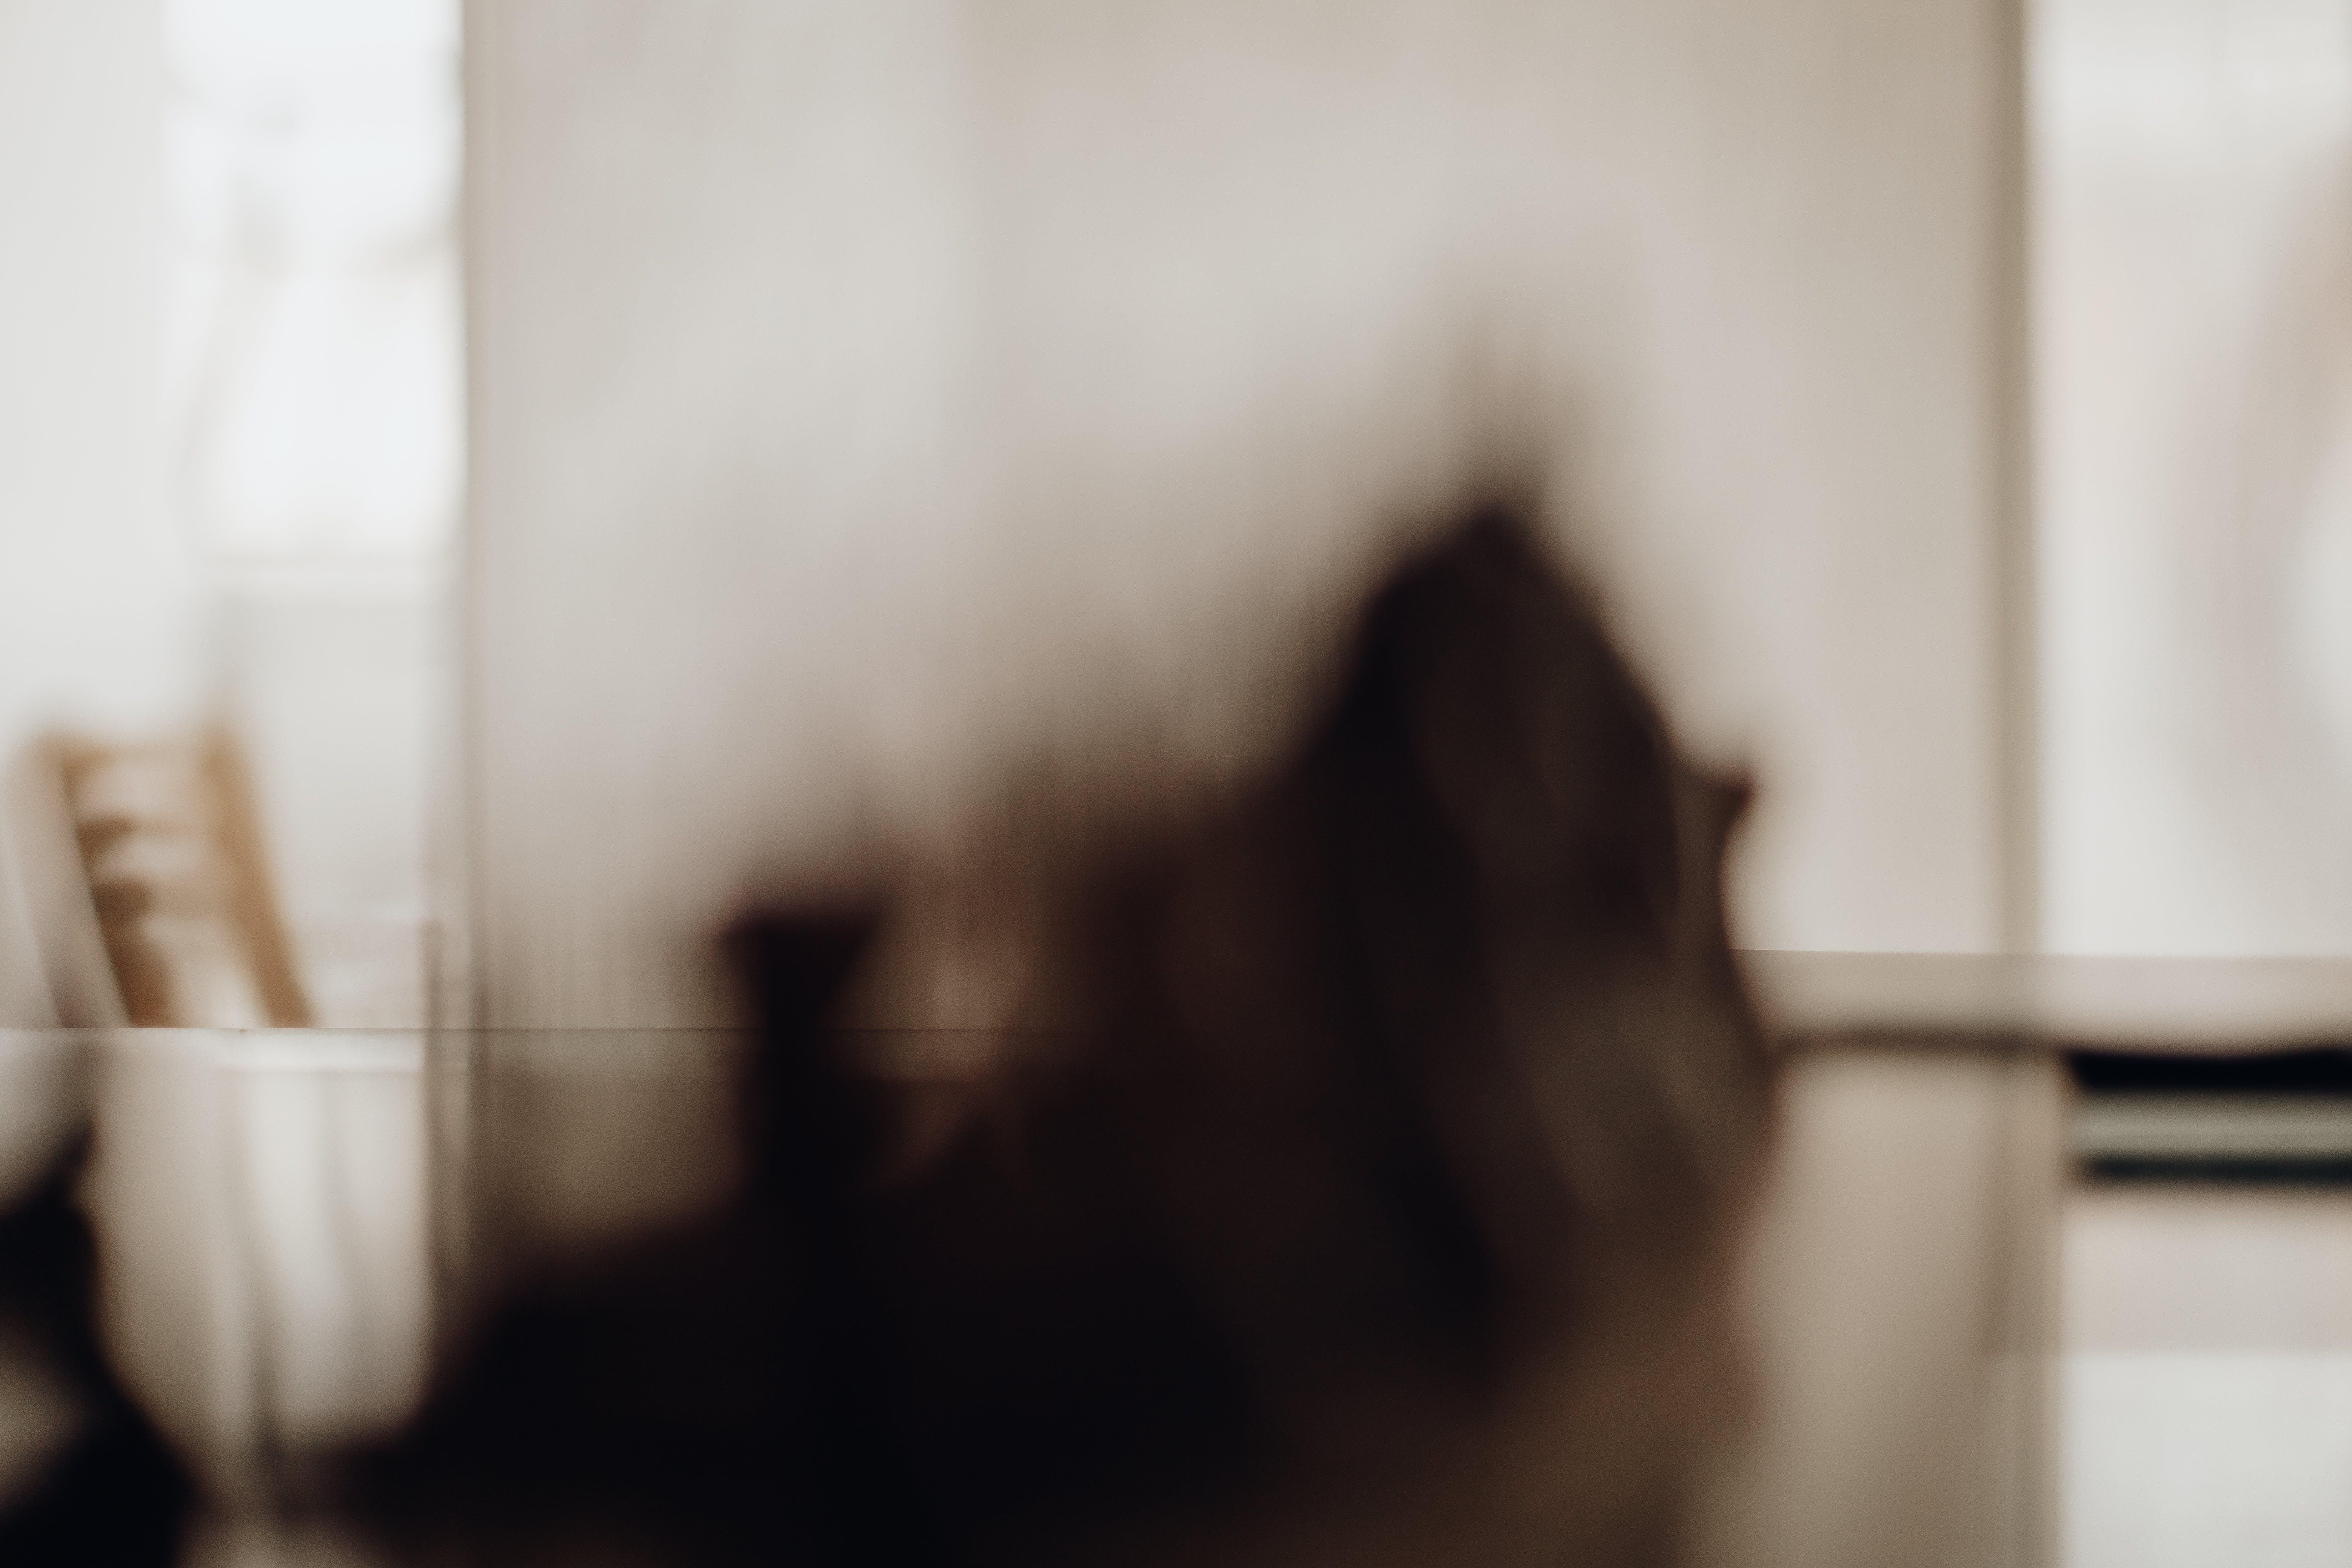 Free stock photo of blur, blurred, blurred background